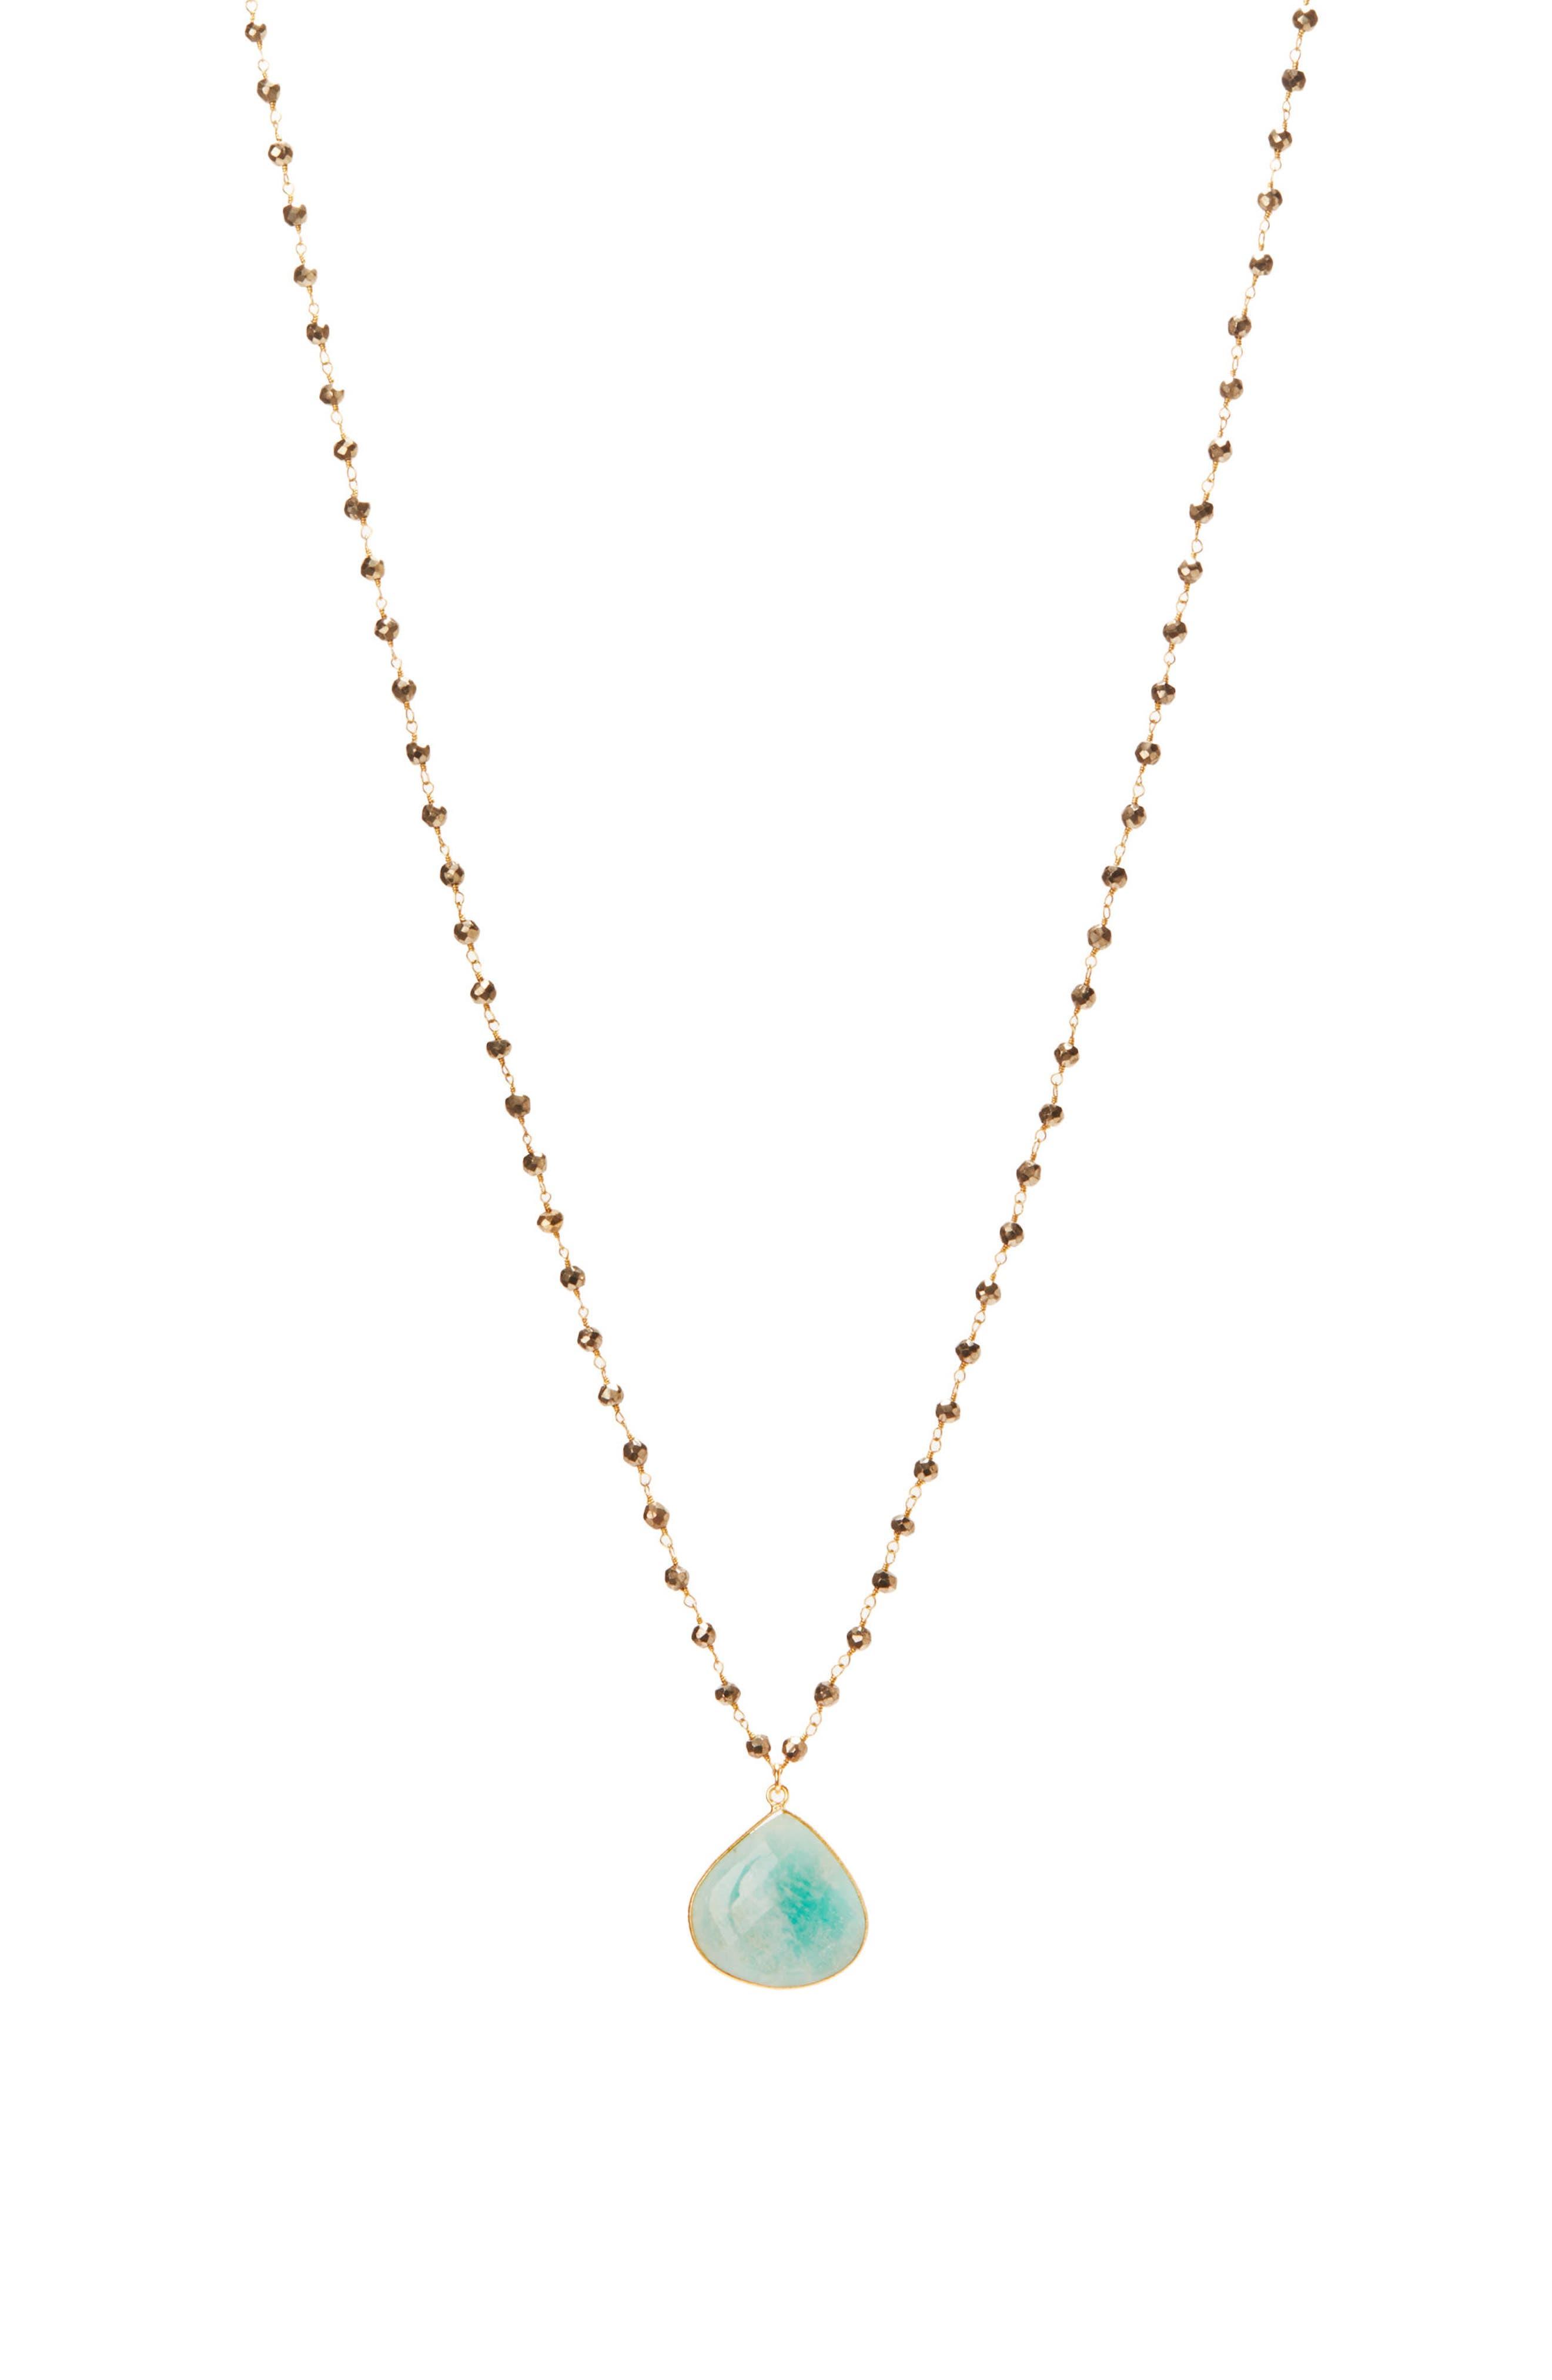 Monterey Semiprecious Stone Pendant Necklace,                             Main thumbnail 1, color,                             Amazonite